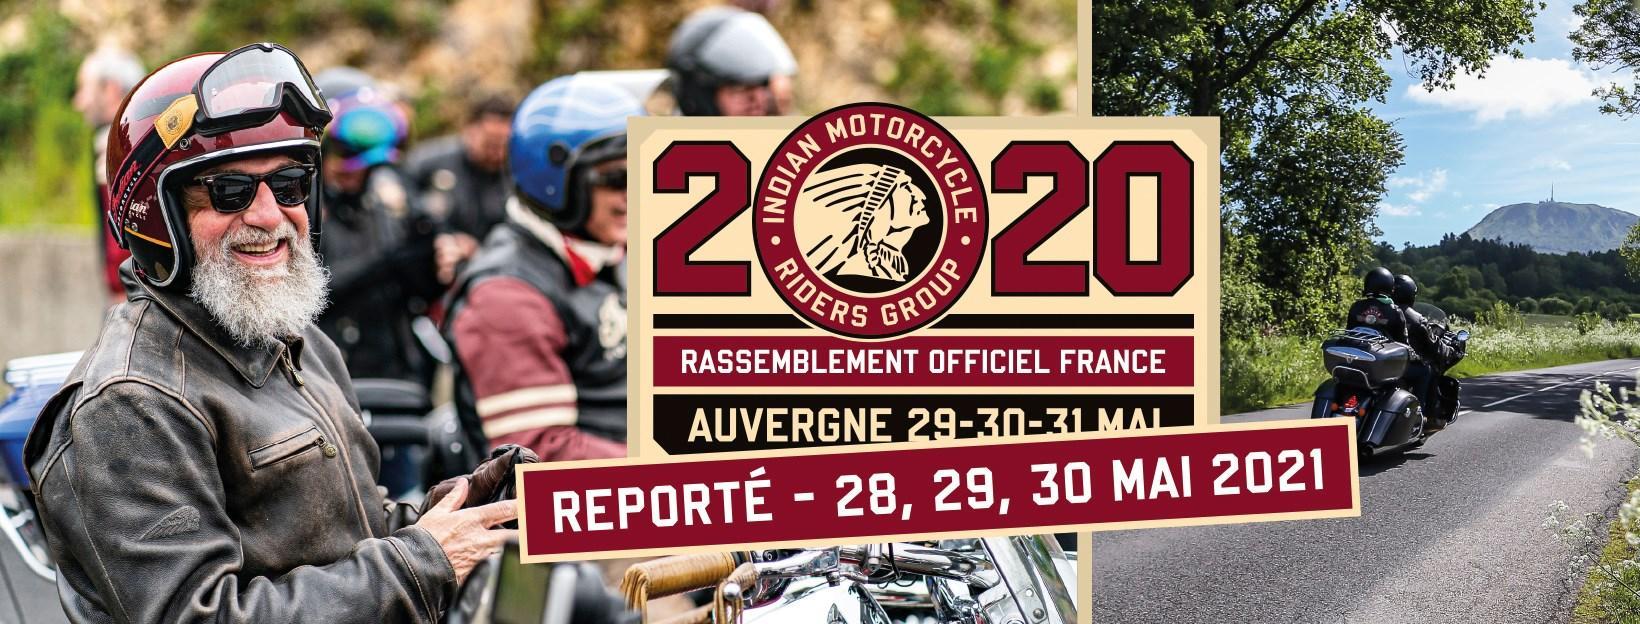 Indian motocycle 2021